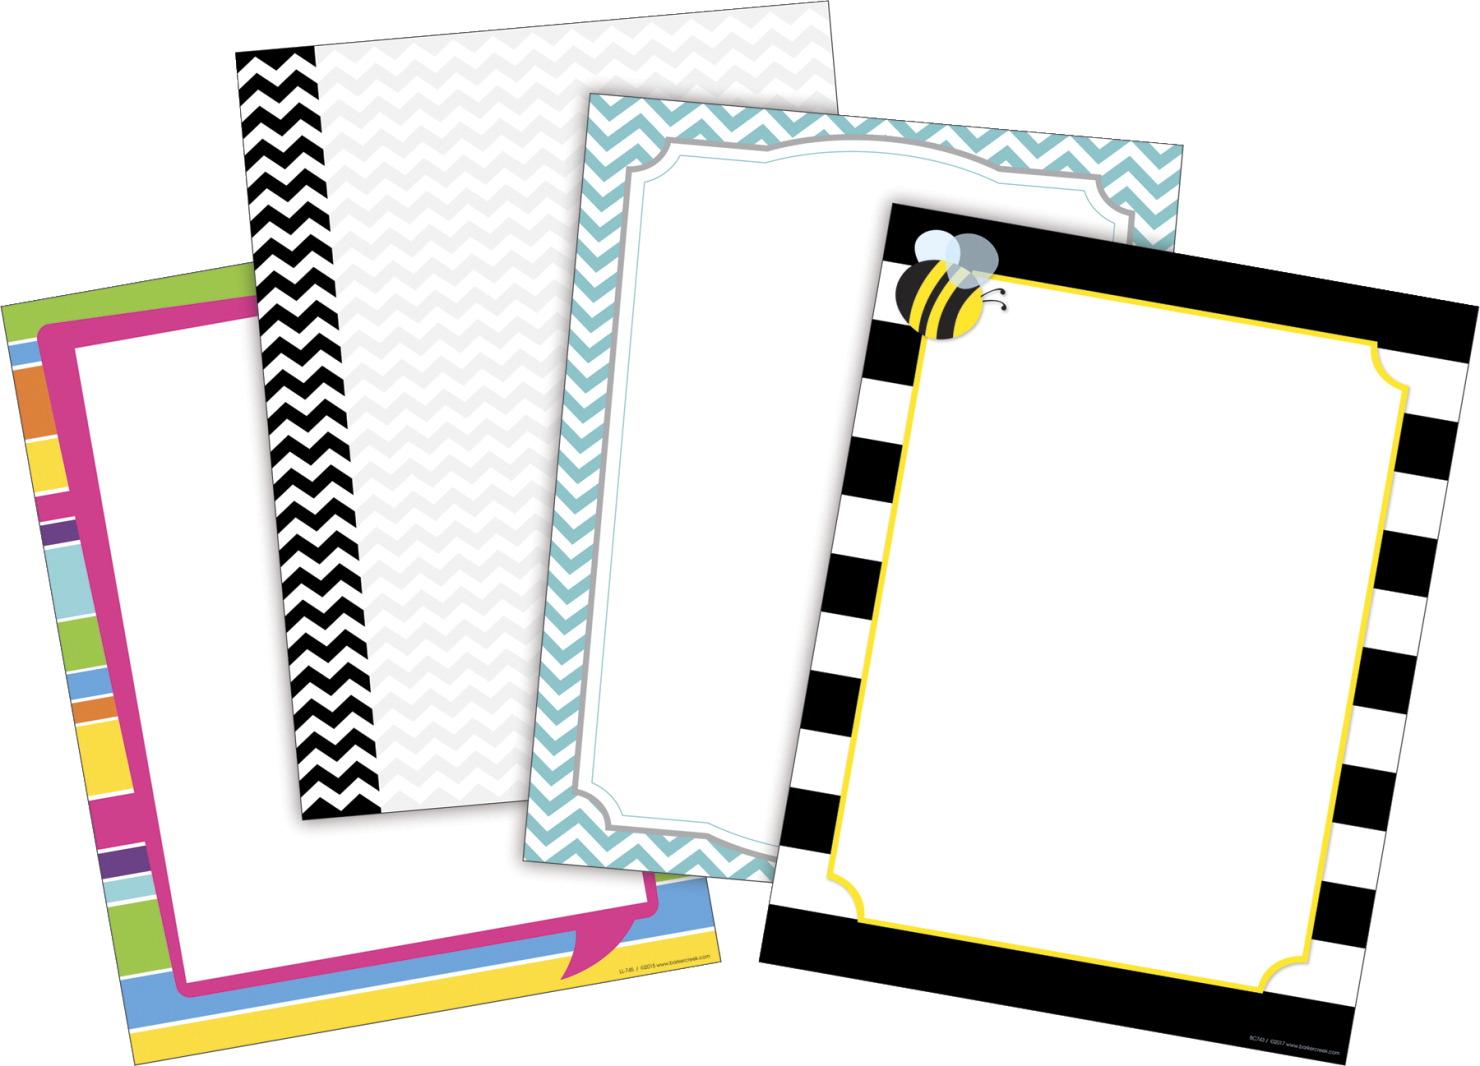 8.5 X 11 Copy Paper - Walmart.com   Save Money. Live Better.